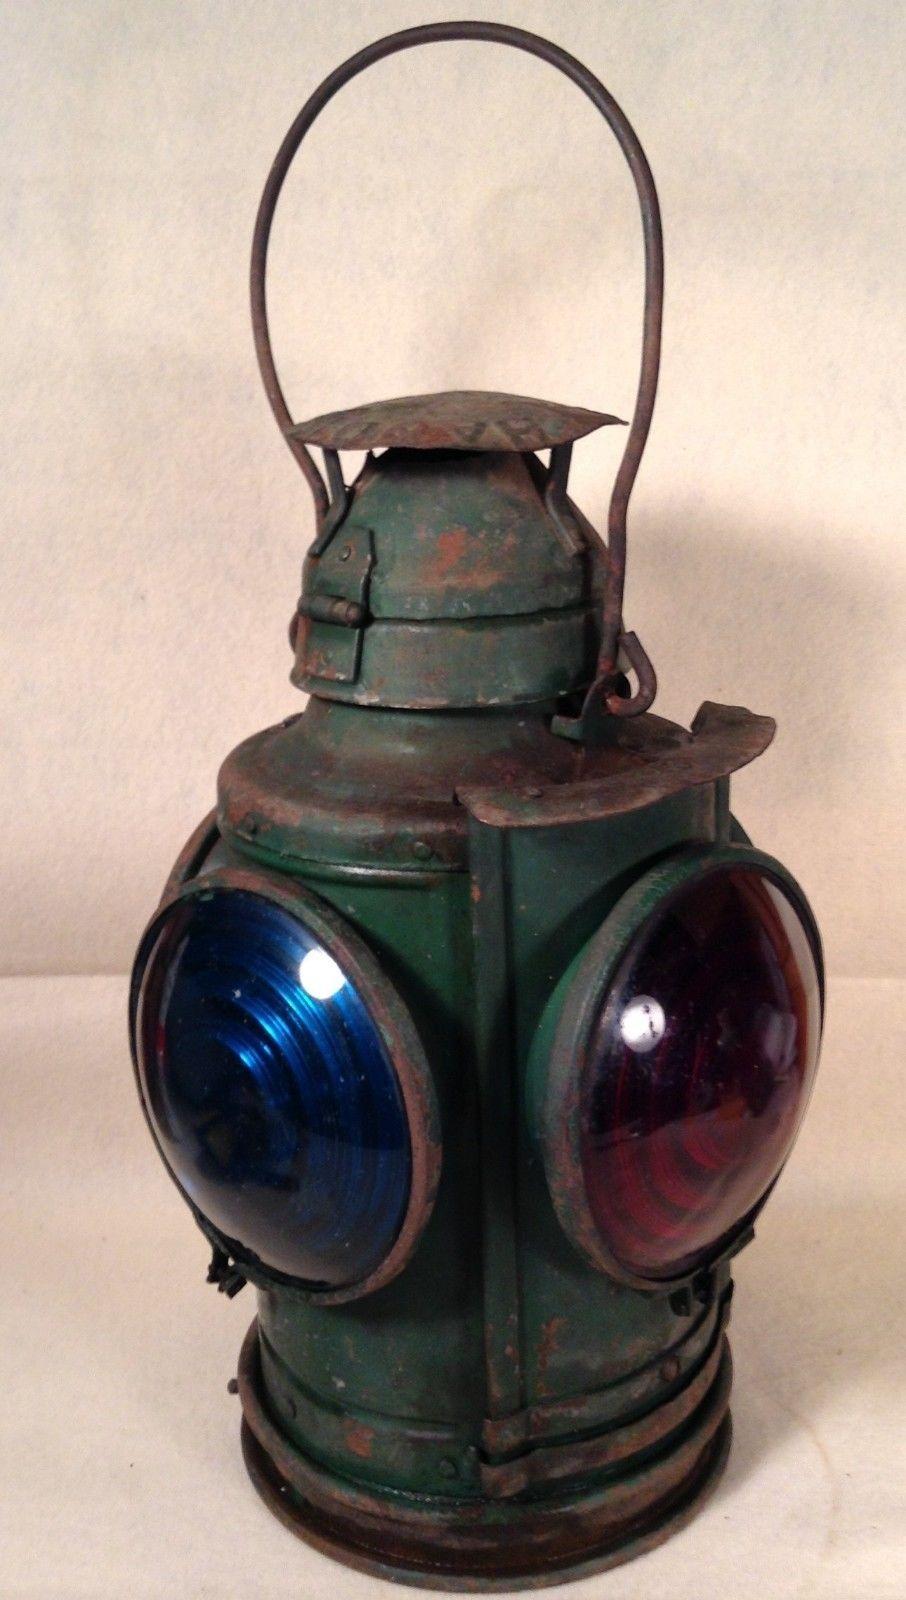 Antique vintage handland railroad lantern st louis 4 lens 1 red antique vintage handland railroad lantern st louis 4 lens 1 red 3 blue lantern light fixturelantern arubaitofo Gallery